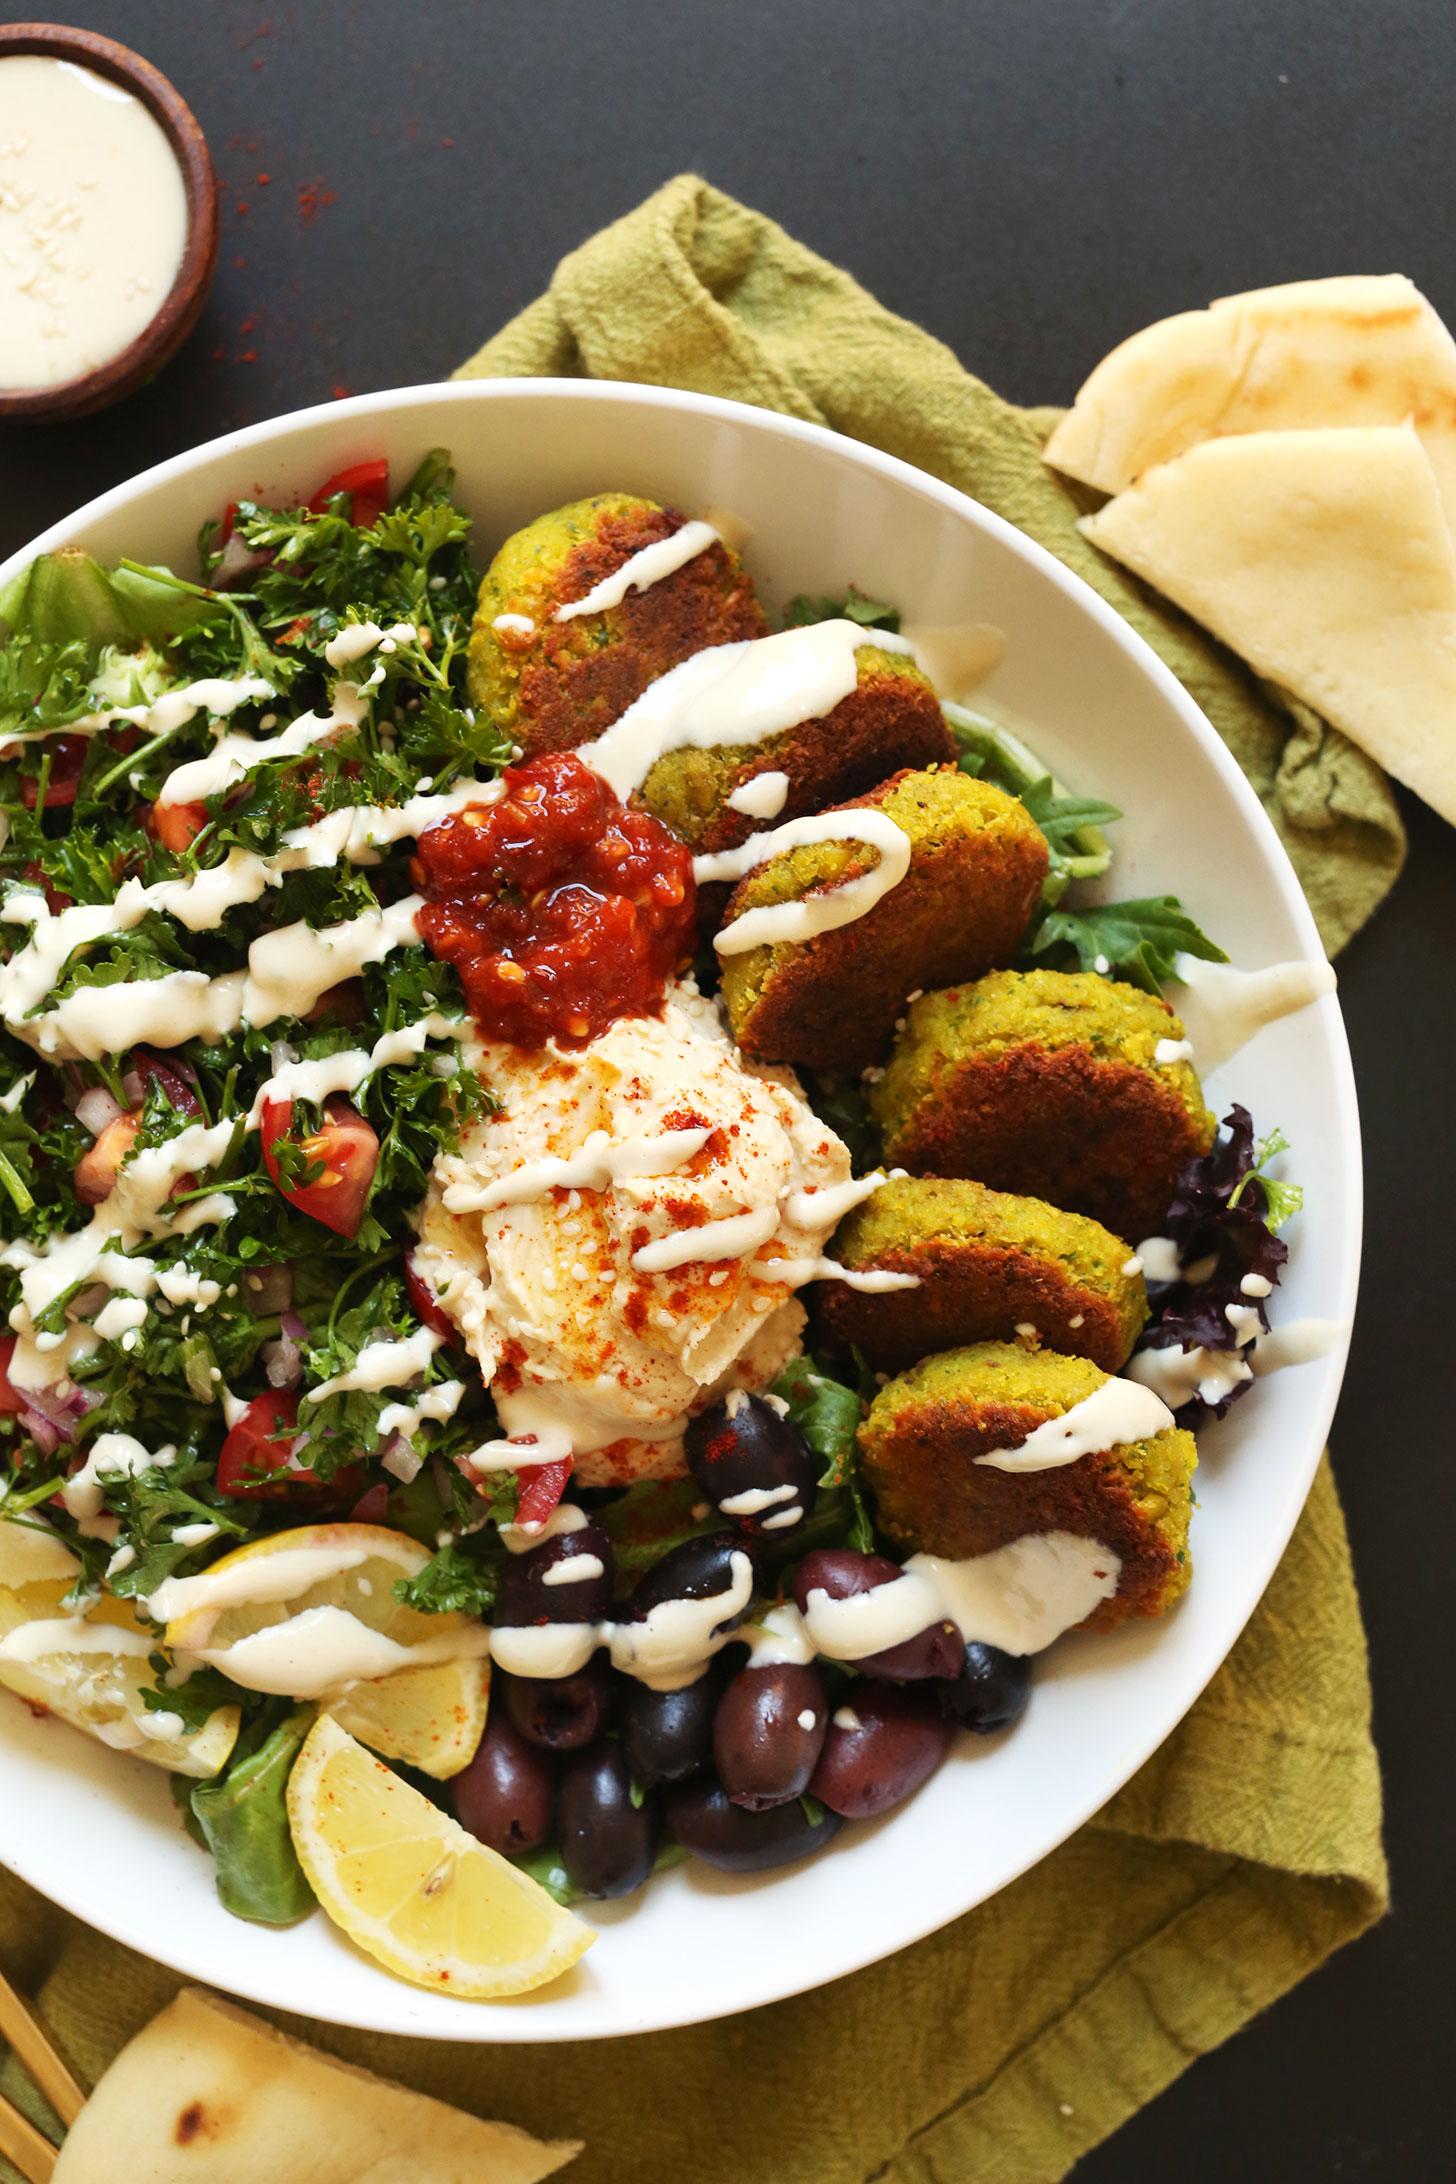 The-ULTIMATE-Mediterranean-Bowl-with-hummus-falafel-tahini-sauce-olives-and-pita-vegan-glutenfree-falafel-recipe-healthy-easy